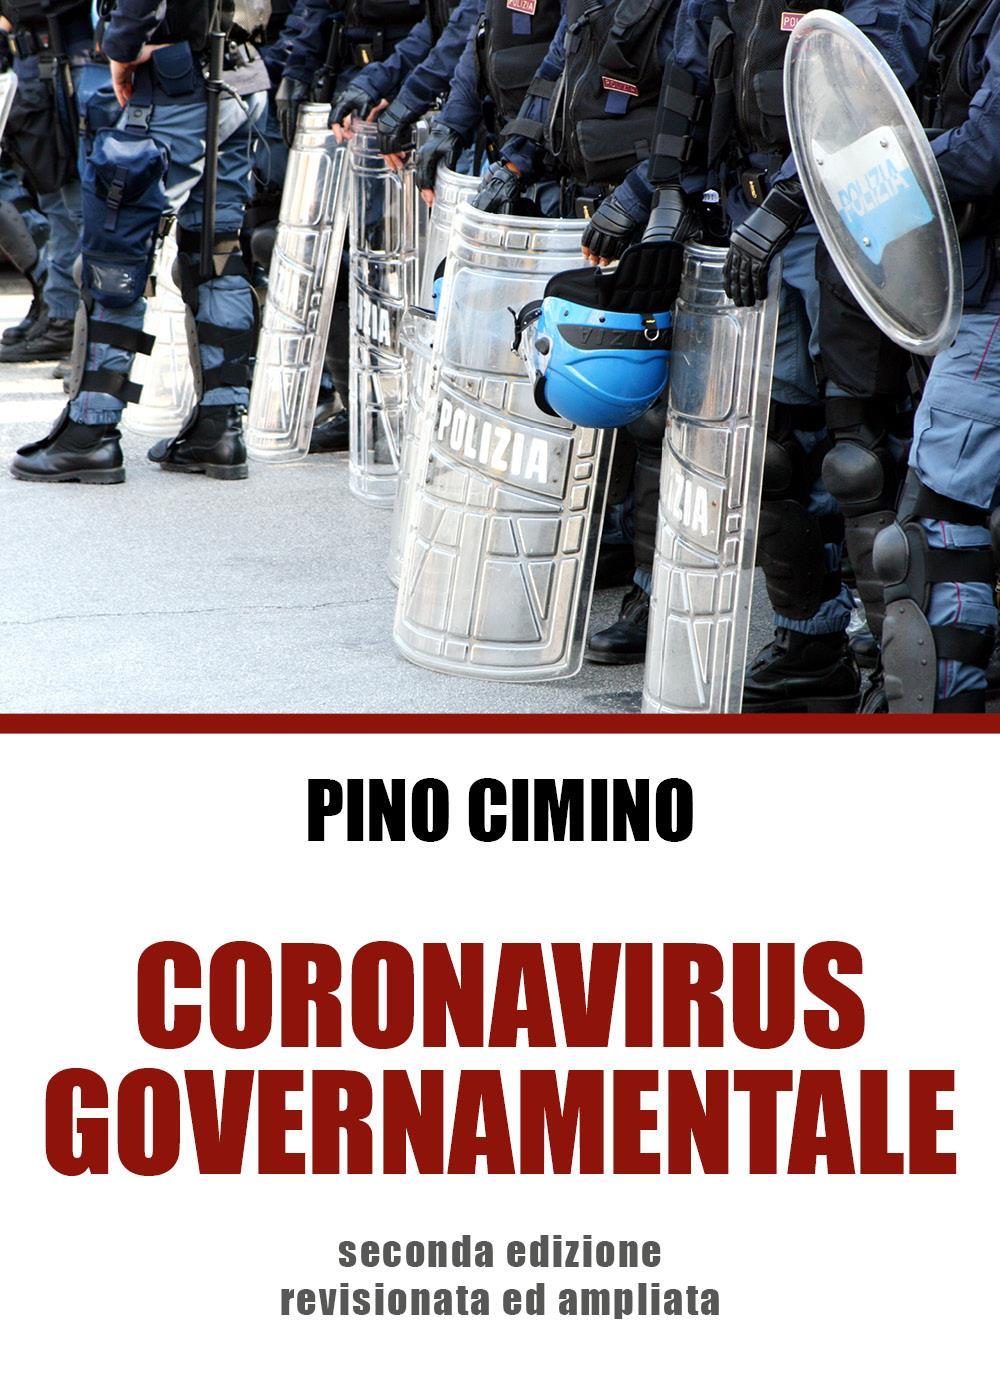 Coronavirus Governamentale